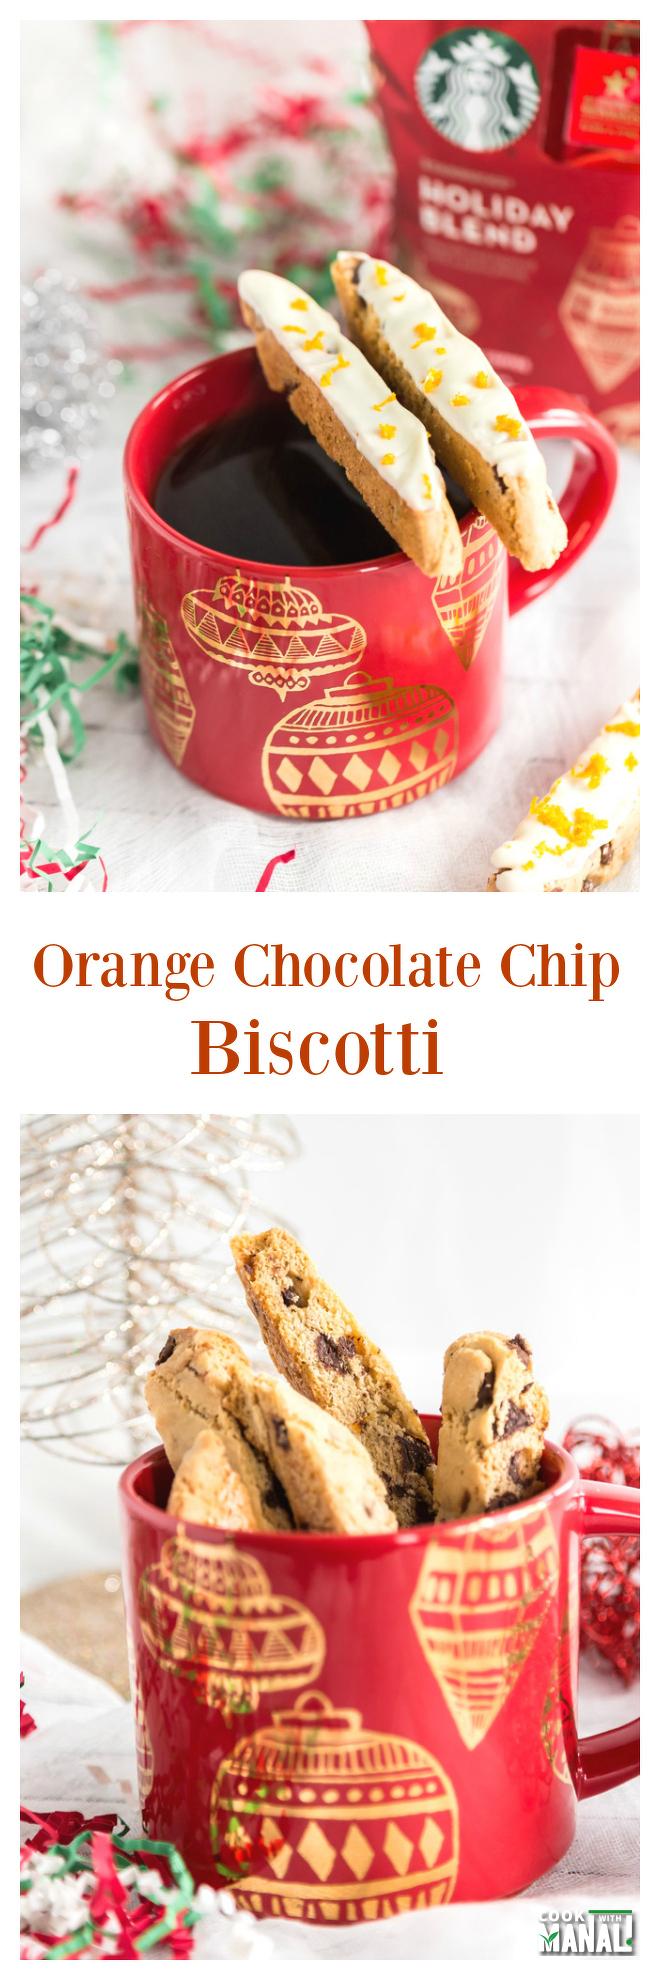 Homemade Orange Chocolate Chip Biscotti Collage